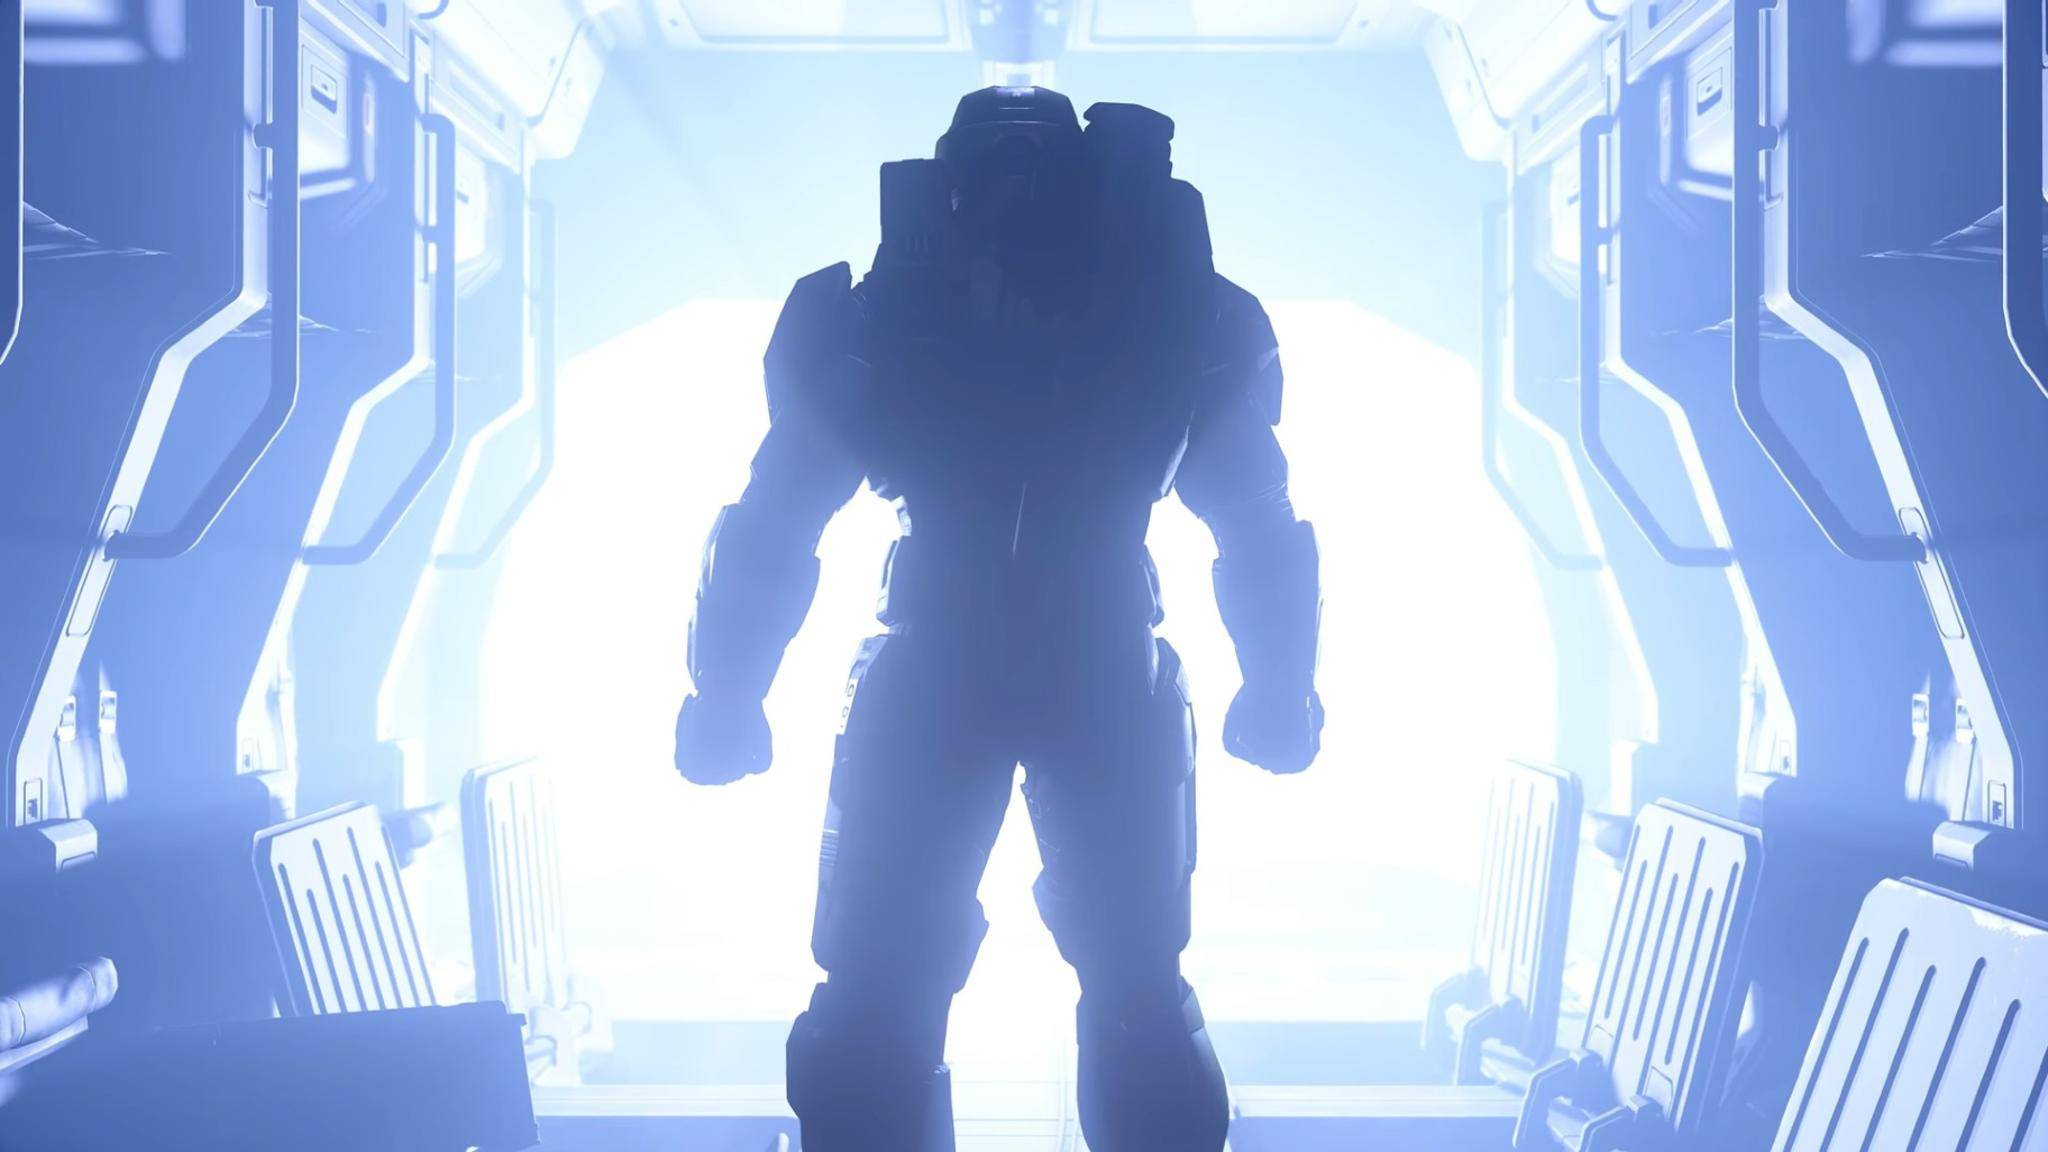 halo-infinite-master-chief-trailer-screenshot